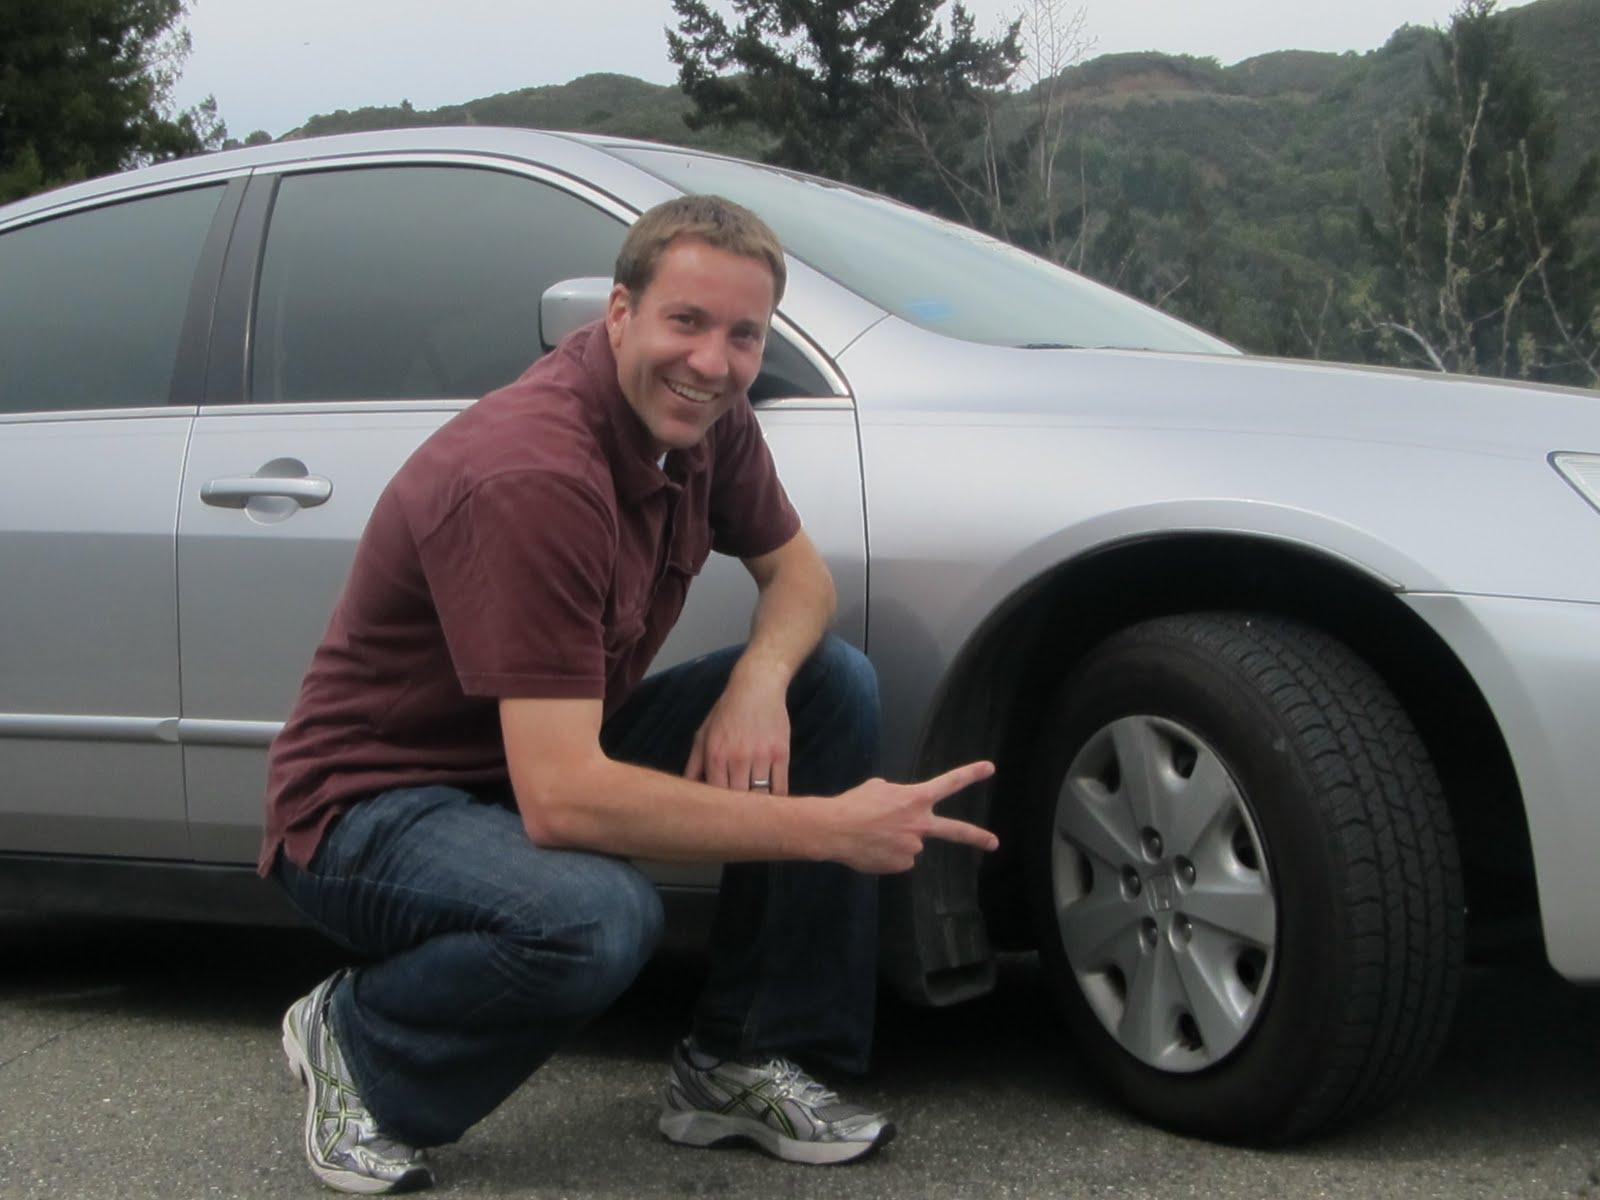 Guy posing with car